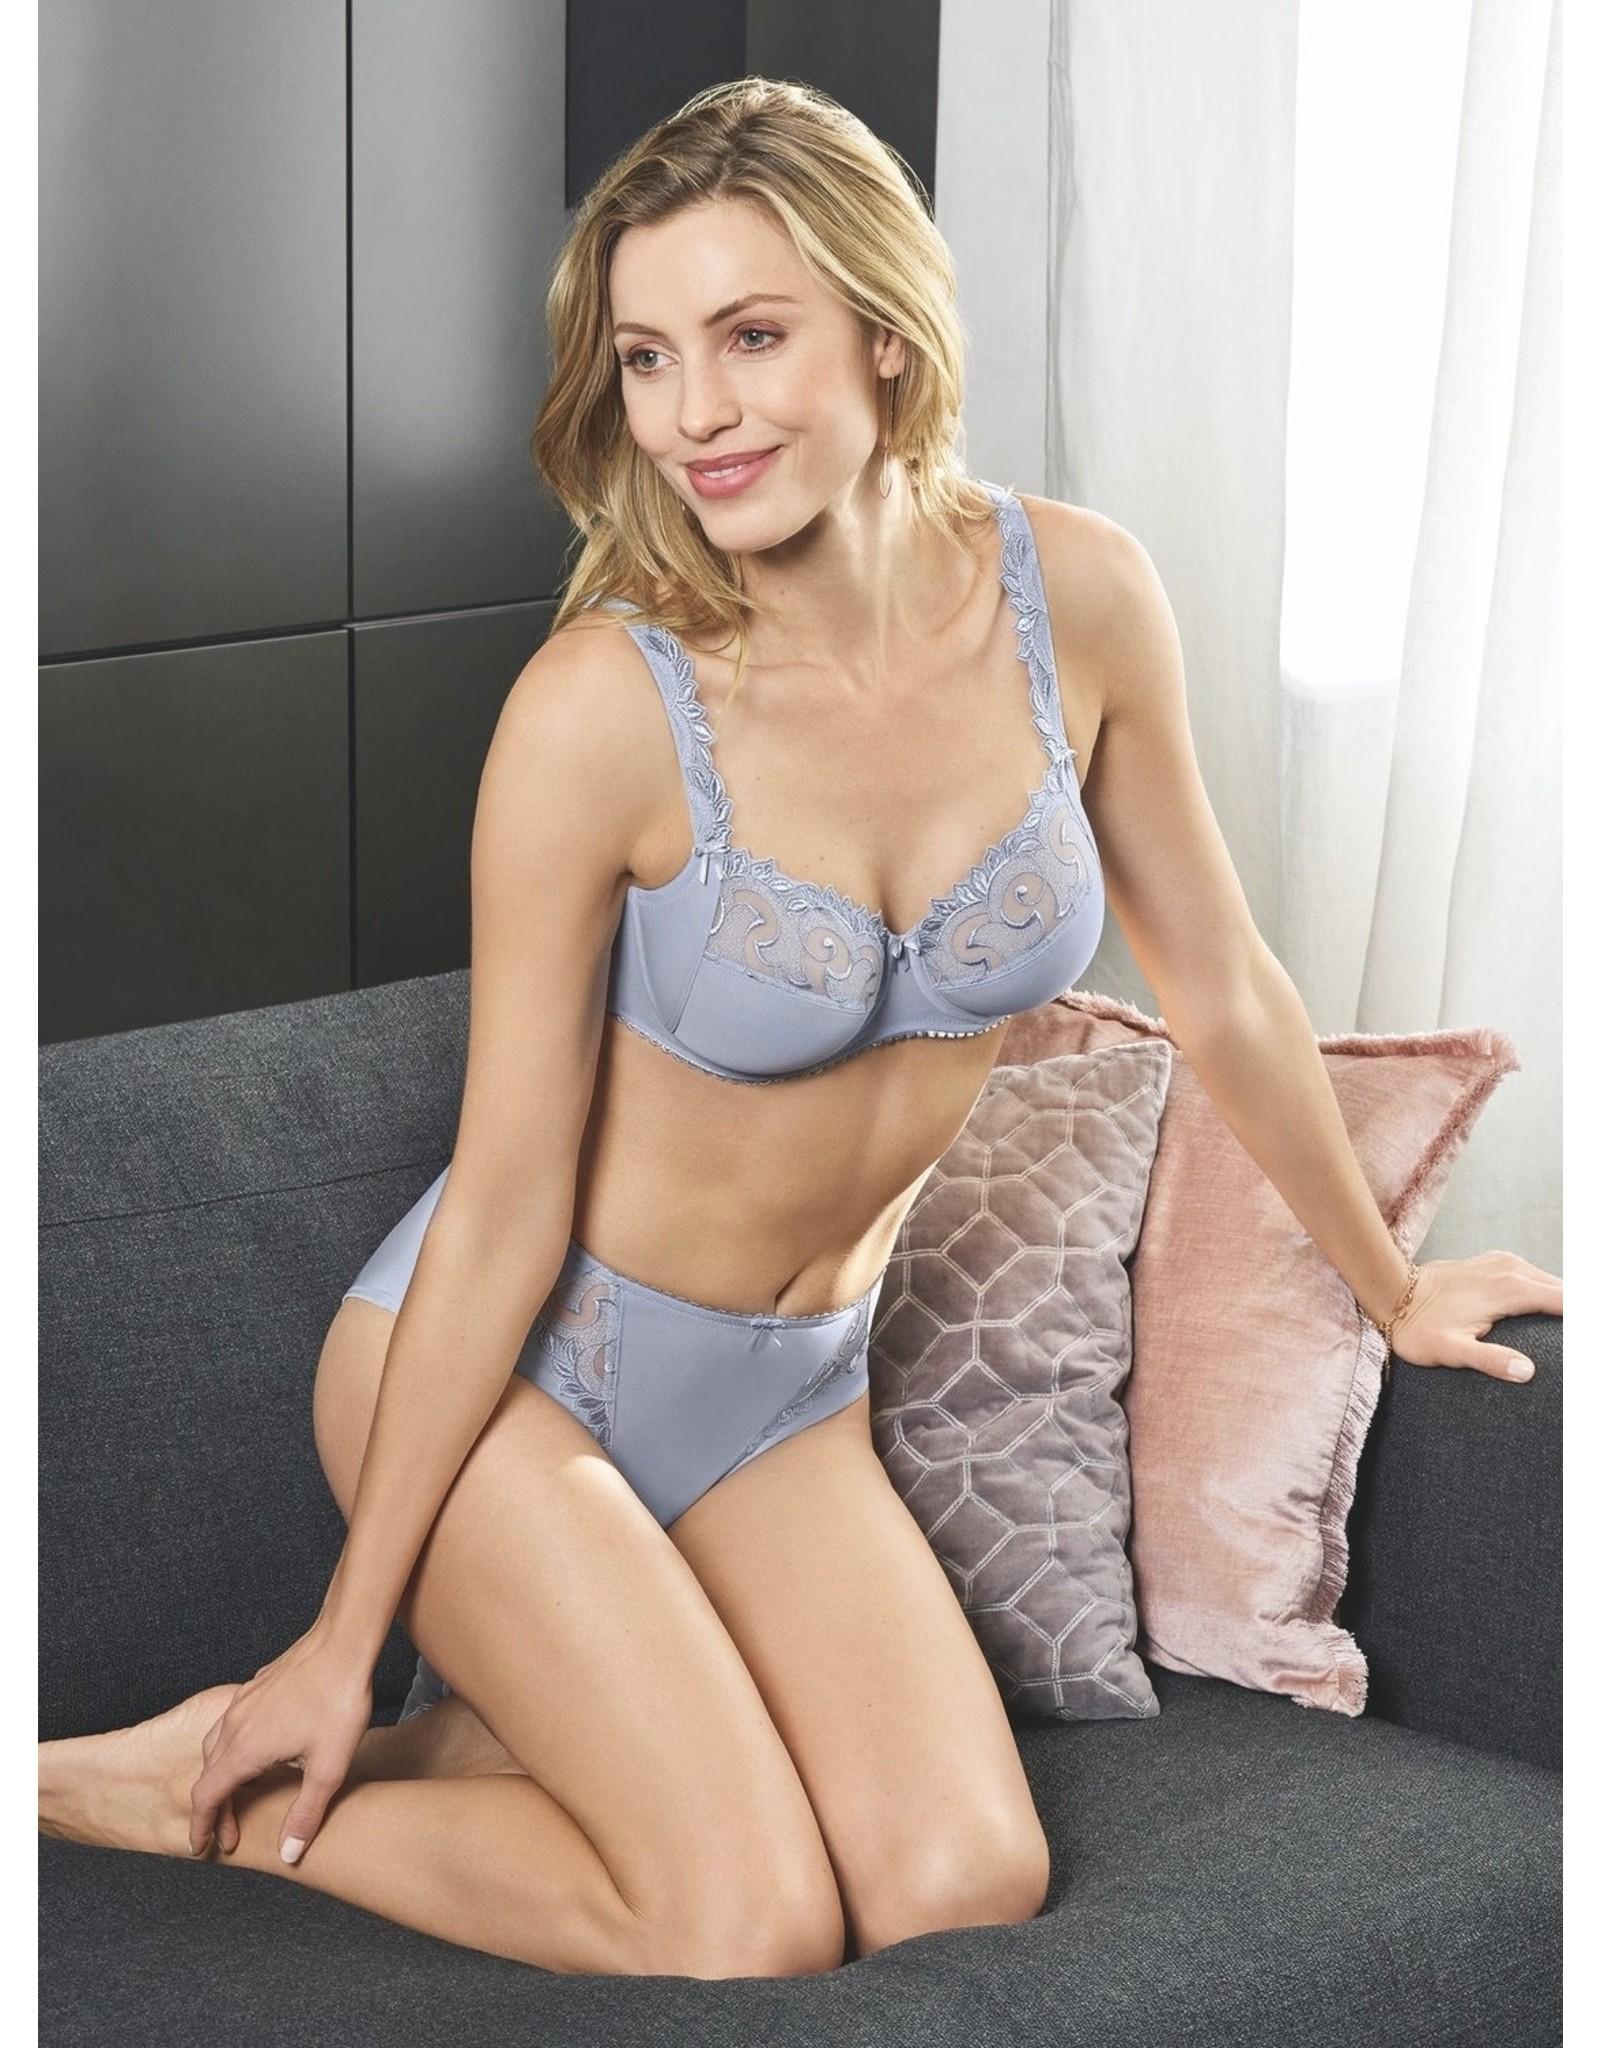 Felina Soutien-gorge Rhapsody 205210 Bleu ciel